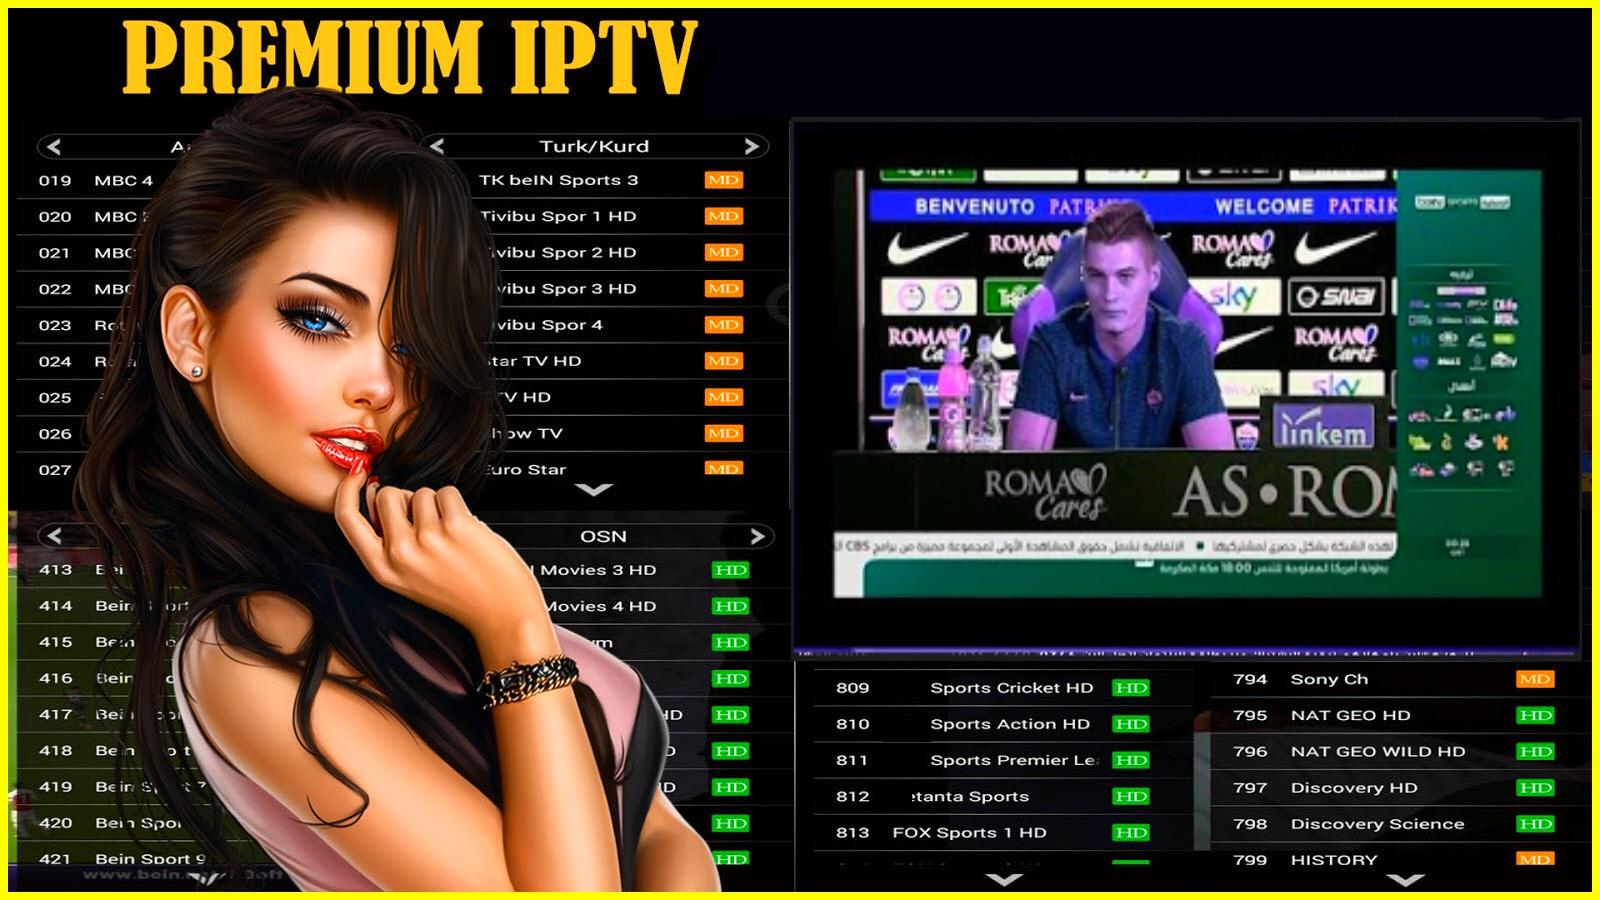 Iptv droid premium apk | IPTV APK: 17+ Best Free IPTV Player APK For